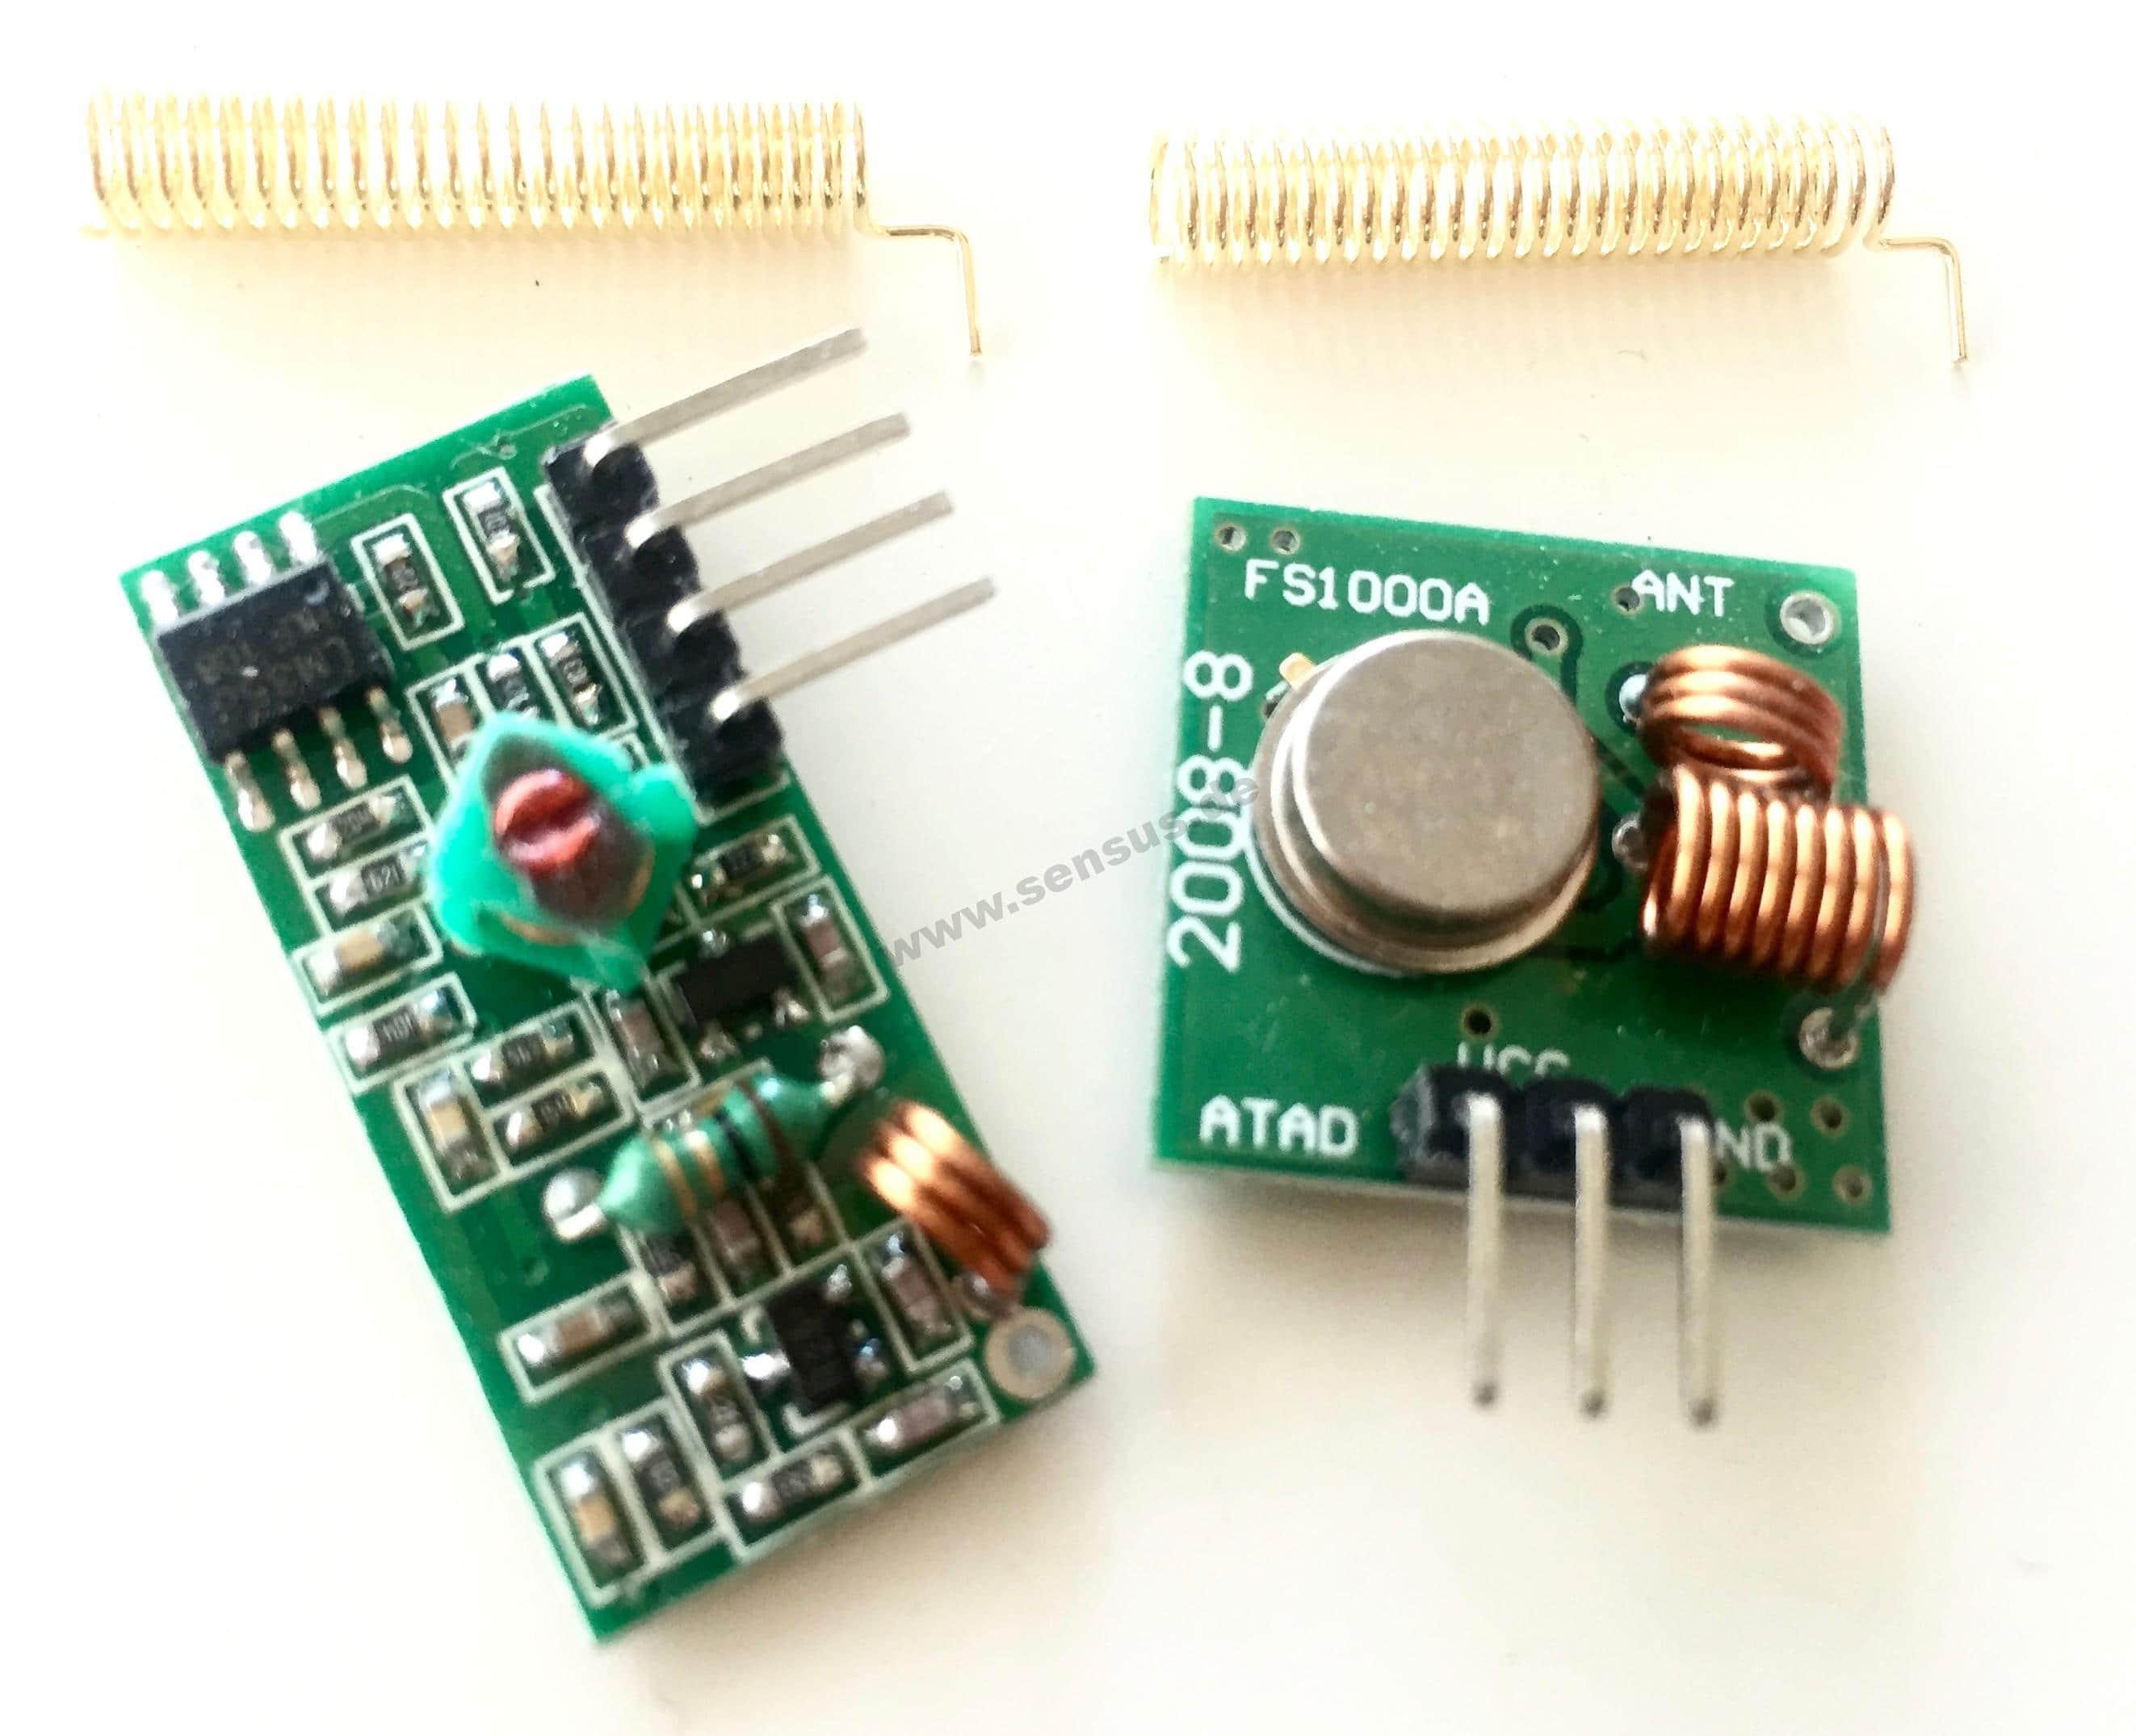 Raspberry Infrarot Entfernungsmesser : 433 mhz sender empfänger komplett set raspberry pi arduino modul